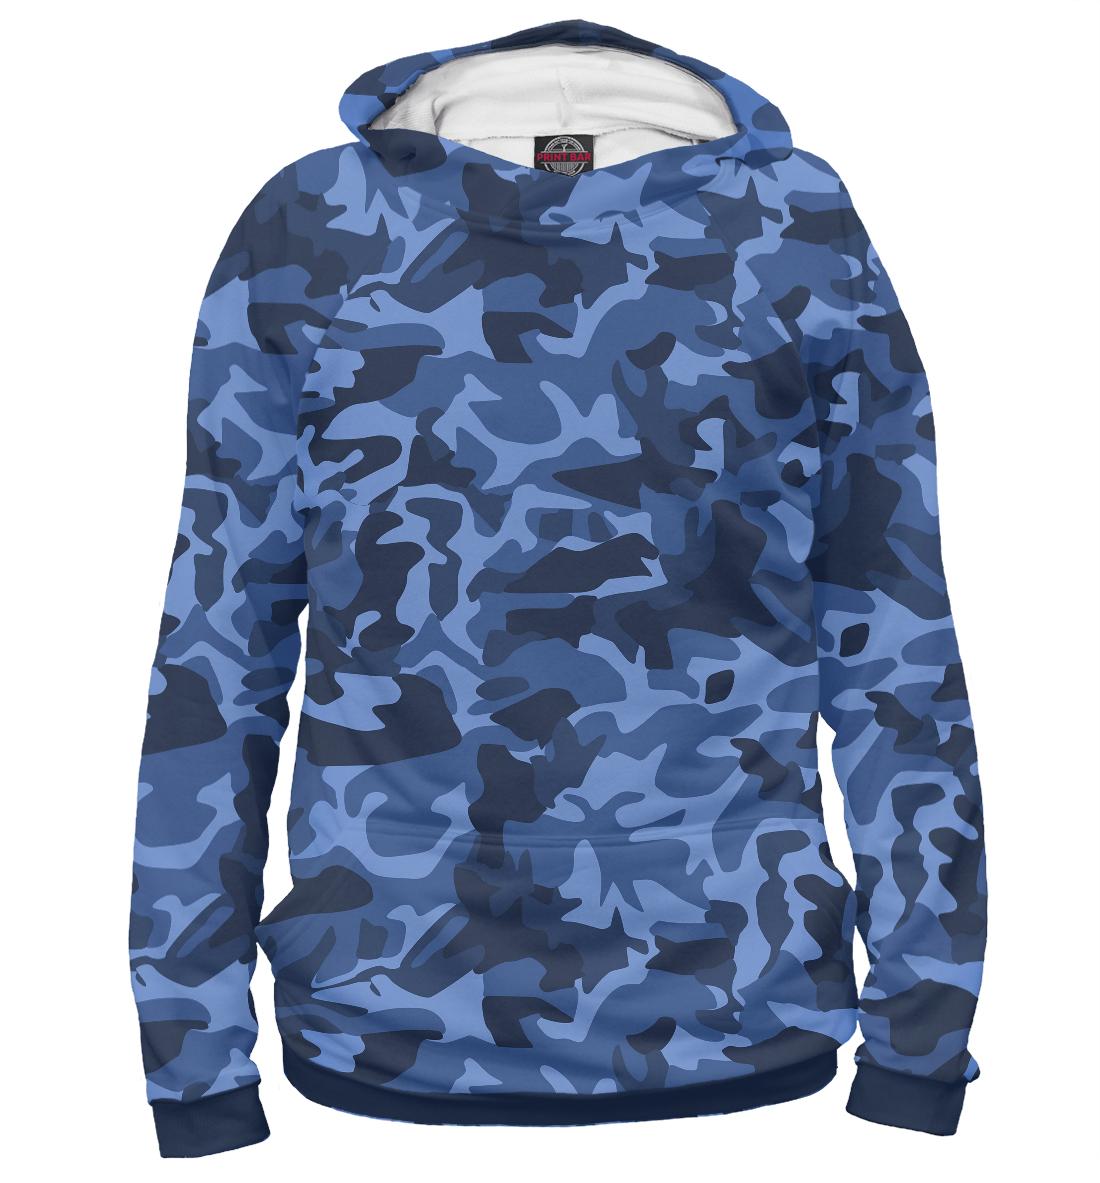 Синий камуфляж кастрюля msr msr windburner 1 8l синий 1 8л